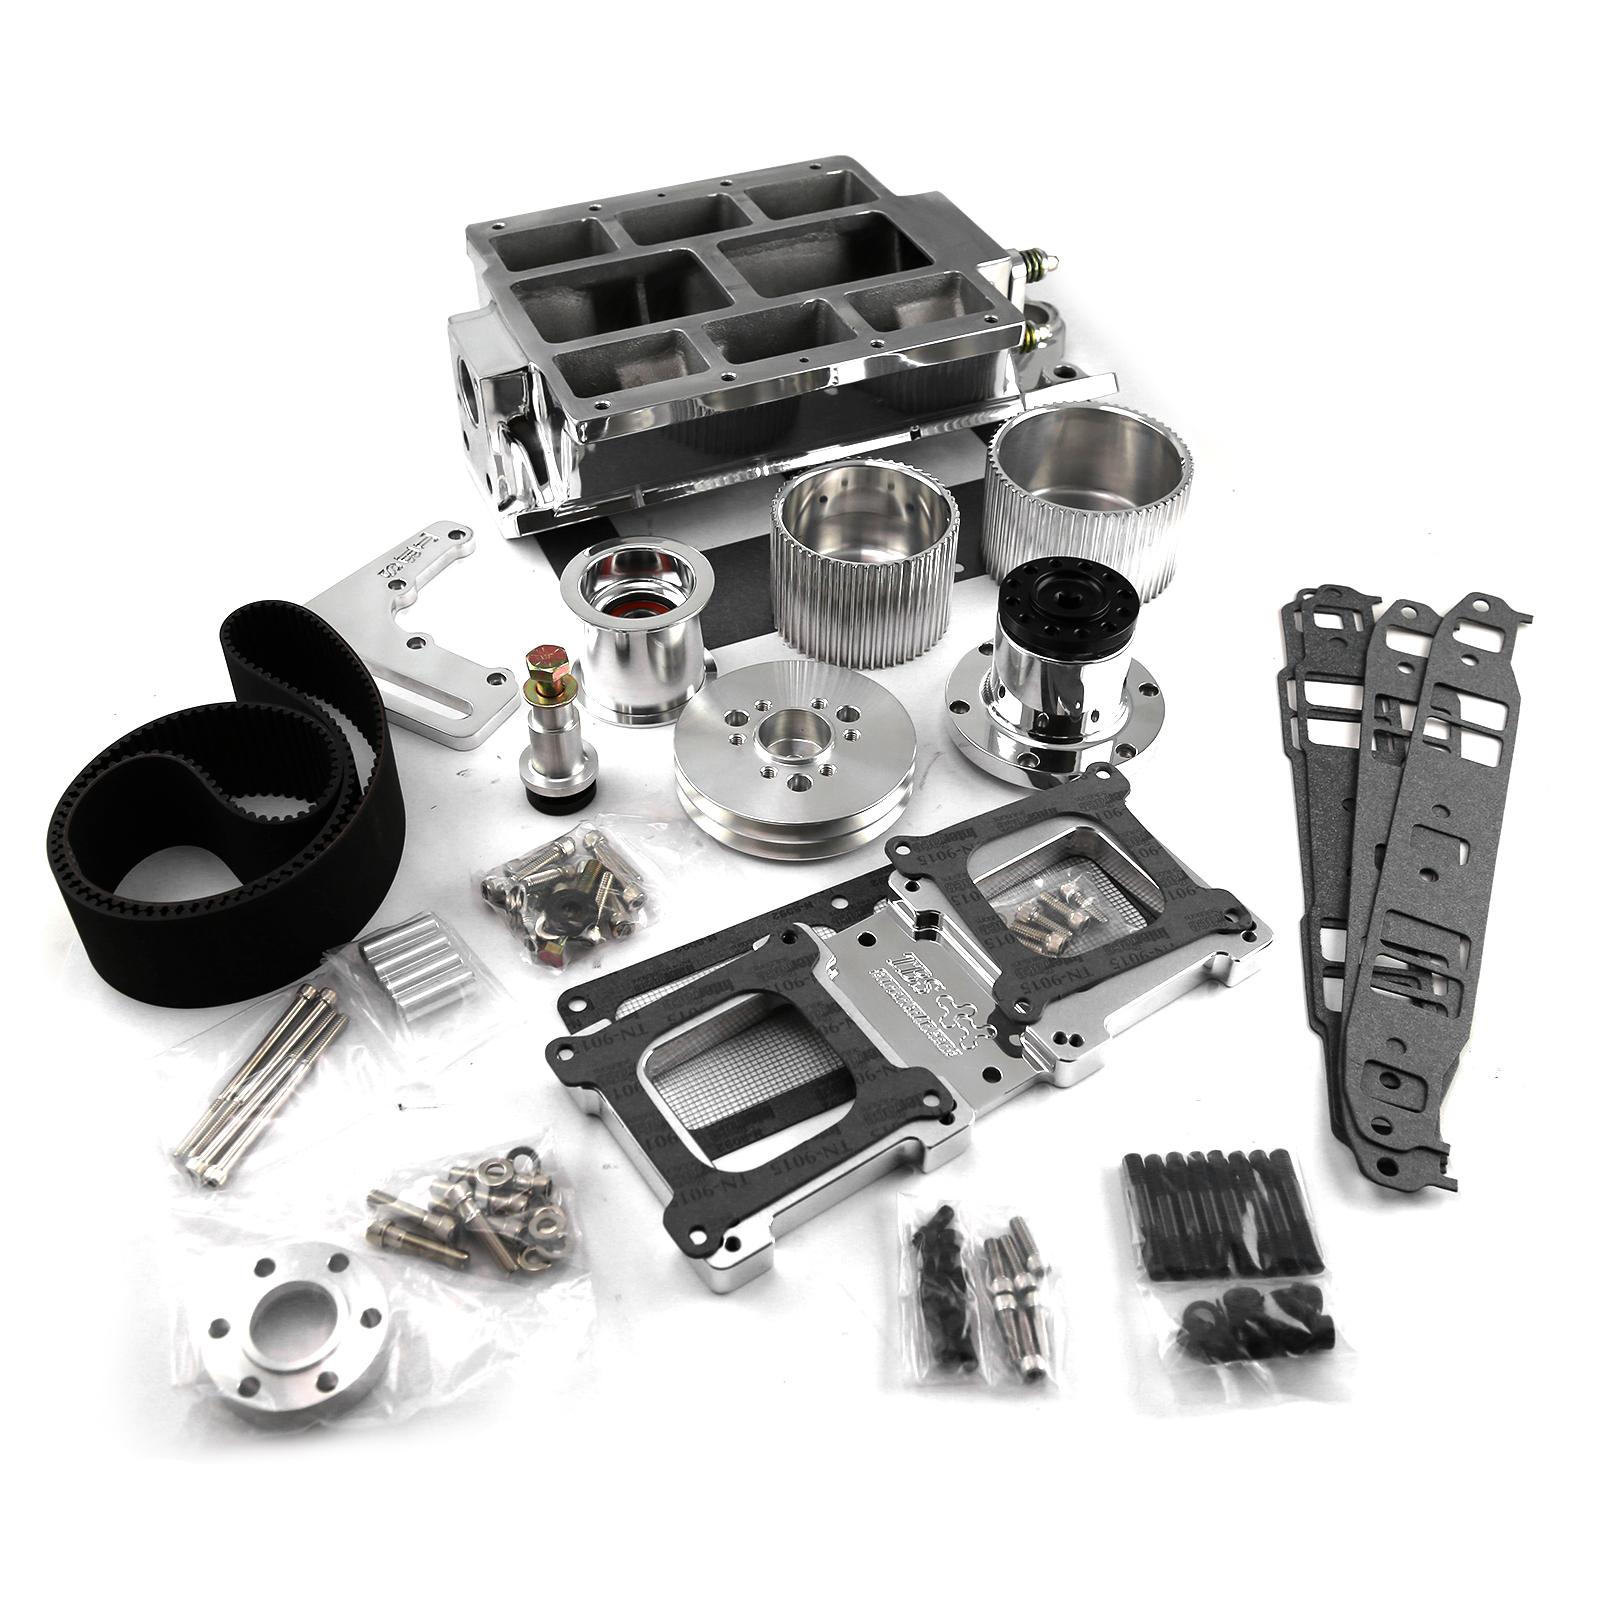 Oldsmobile Supercharger Kits: The Blower Shop SBC Std Port Polished 2V Accessory Drive